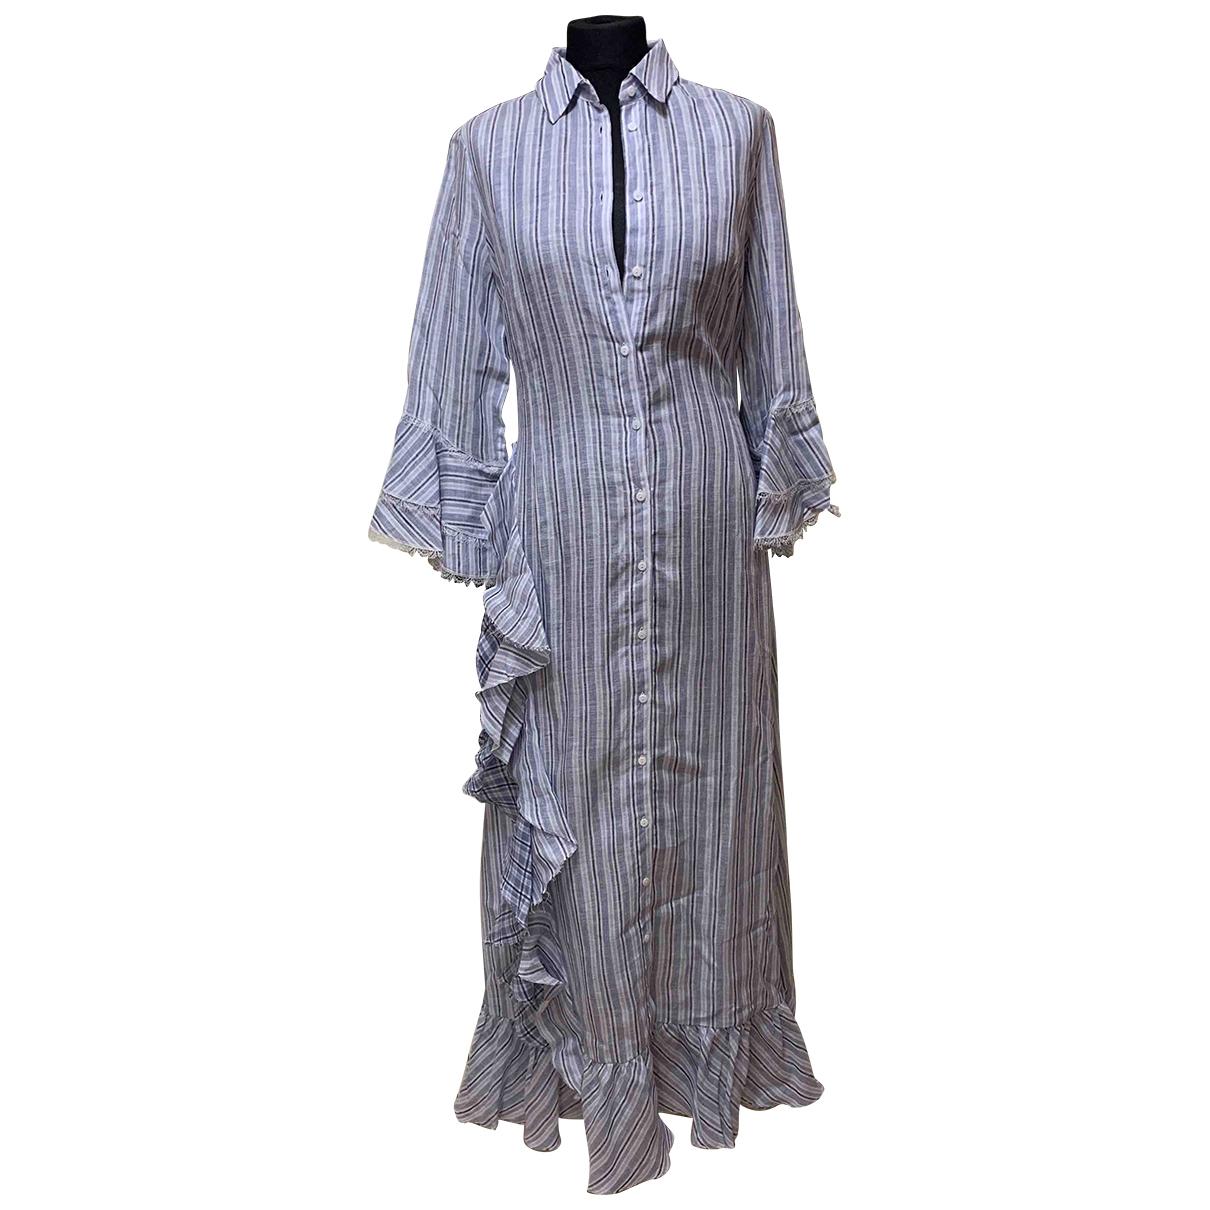 Ermanno Scervino \N Navy Linen dress for Women 42 IT